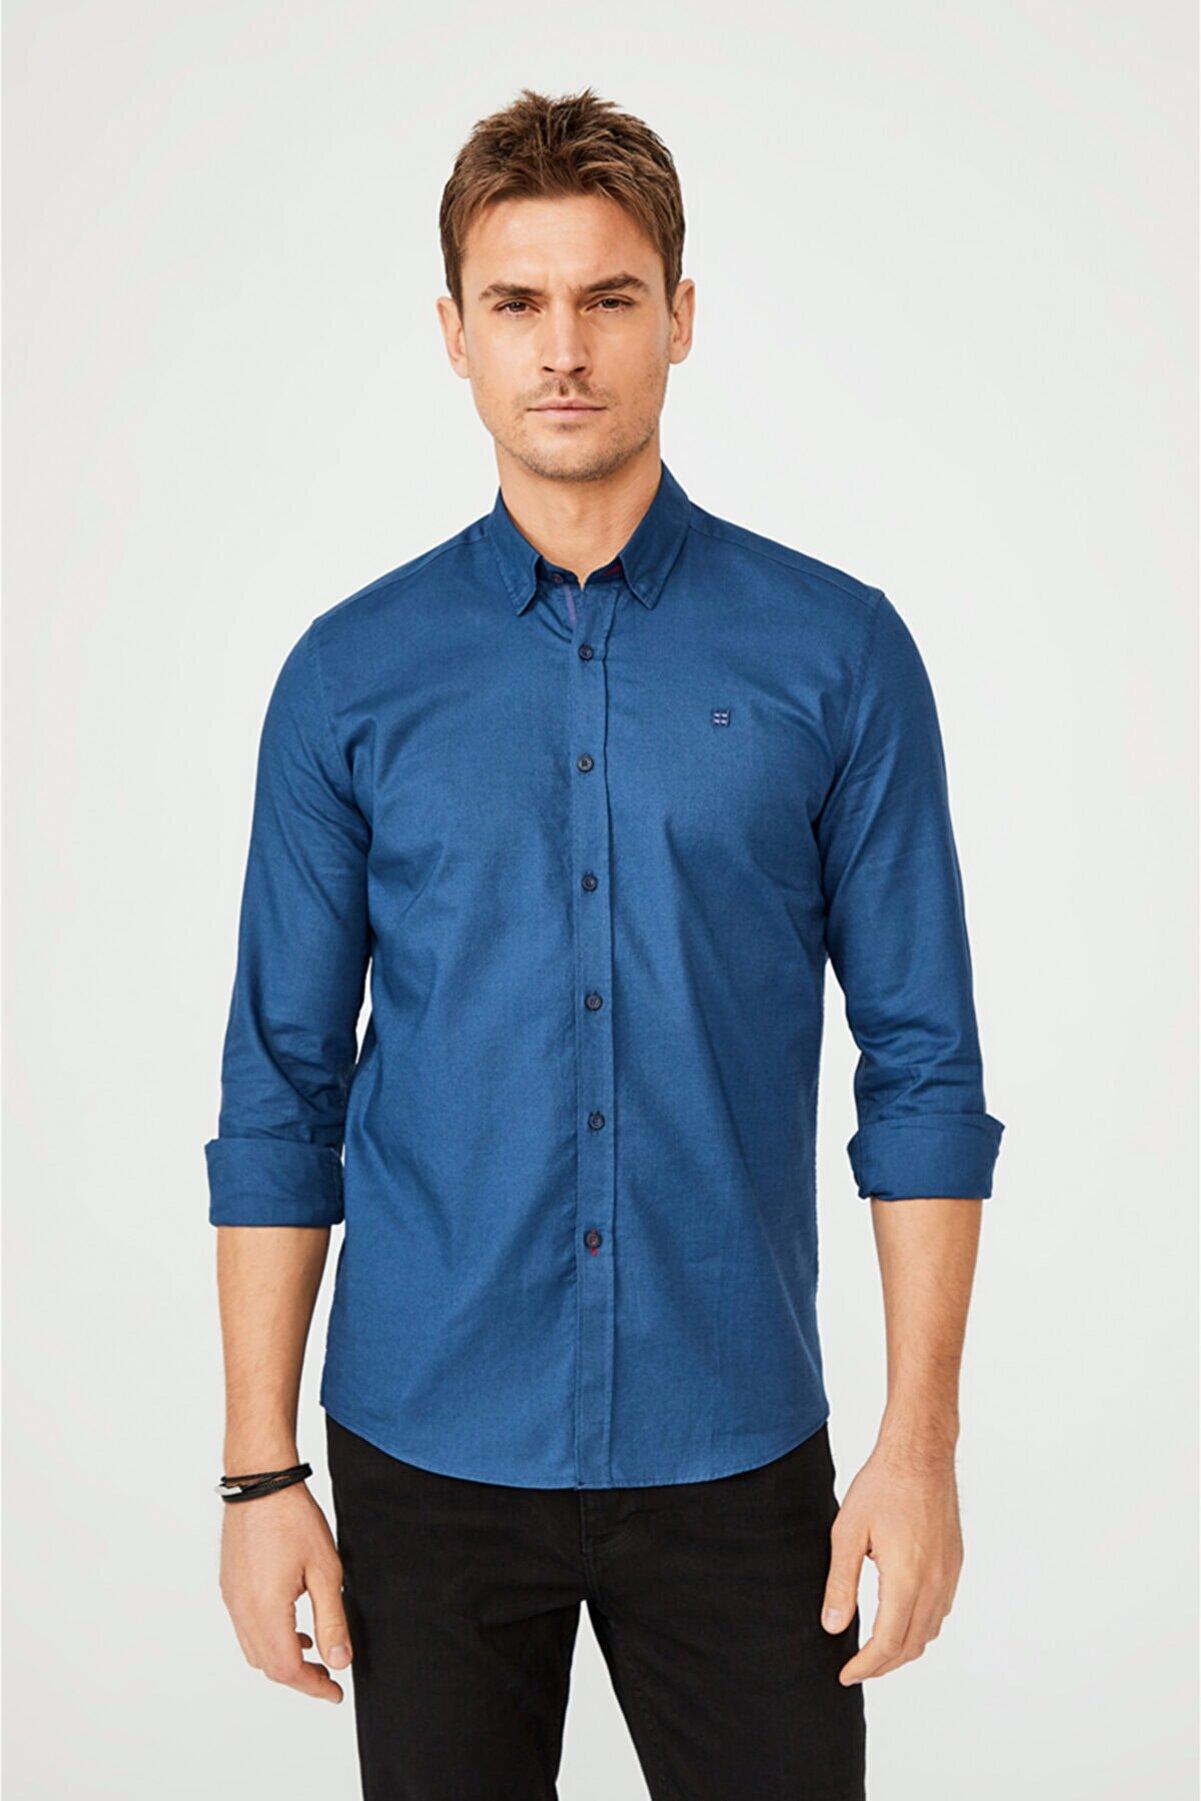 Avva Erkek Indigo Düz Alttan Britli Yaka Slim Fit Gömlek A02y2244